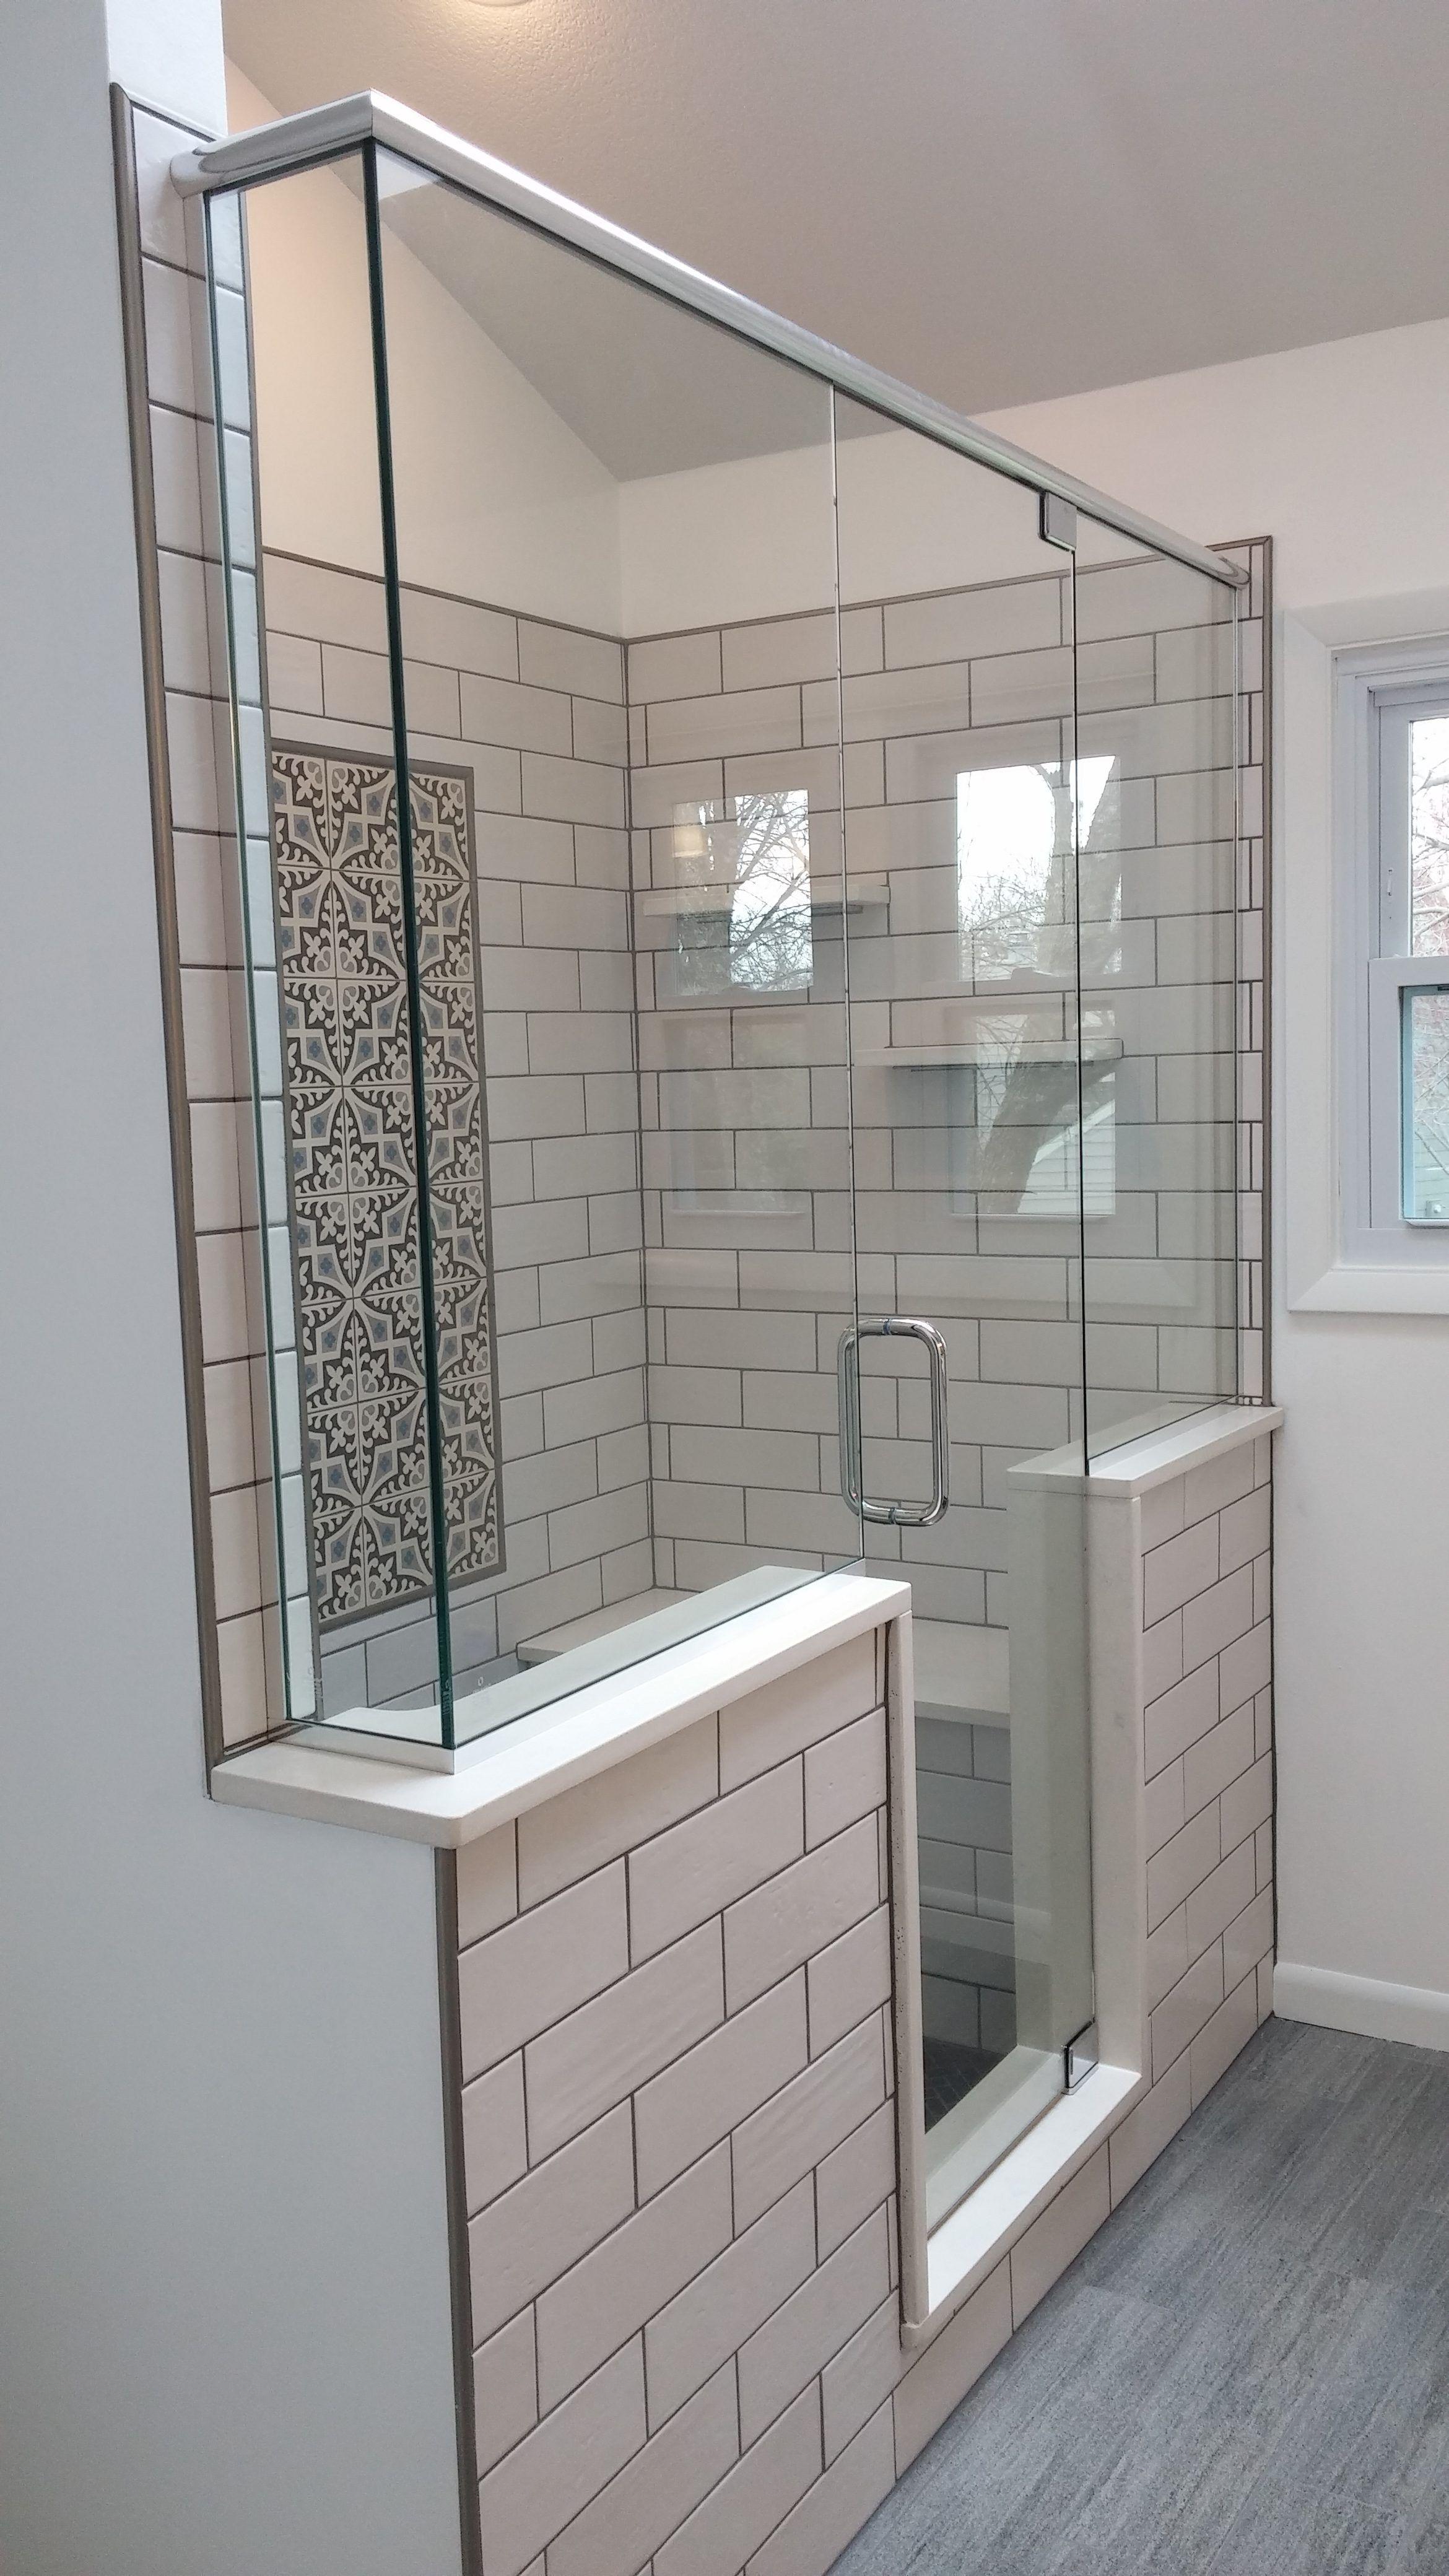 Walk In Shower Bathroom Remodel Des Moines Sassman Glass And - Bathroom remodel des moines for bathroom decor ideas